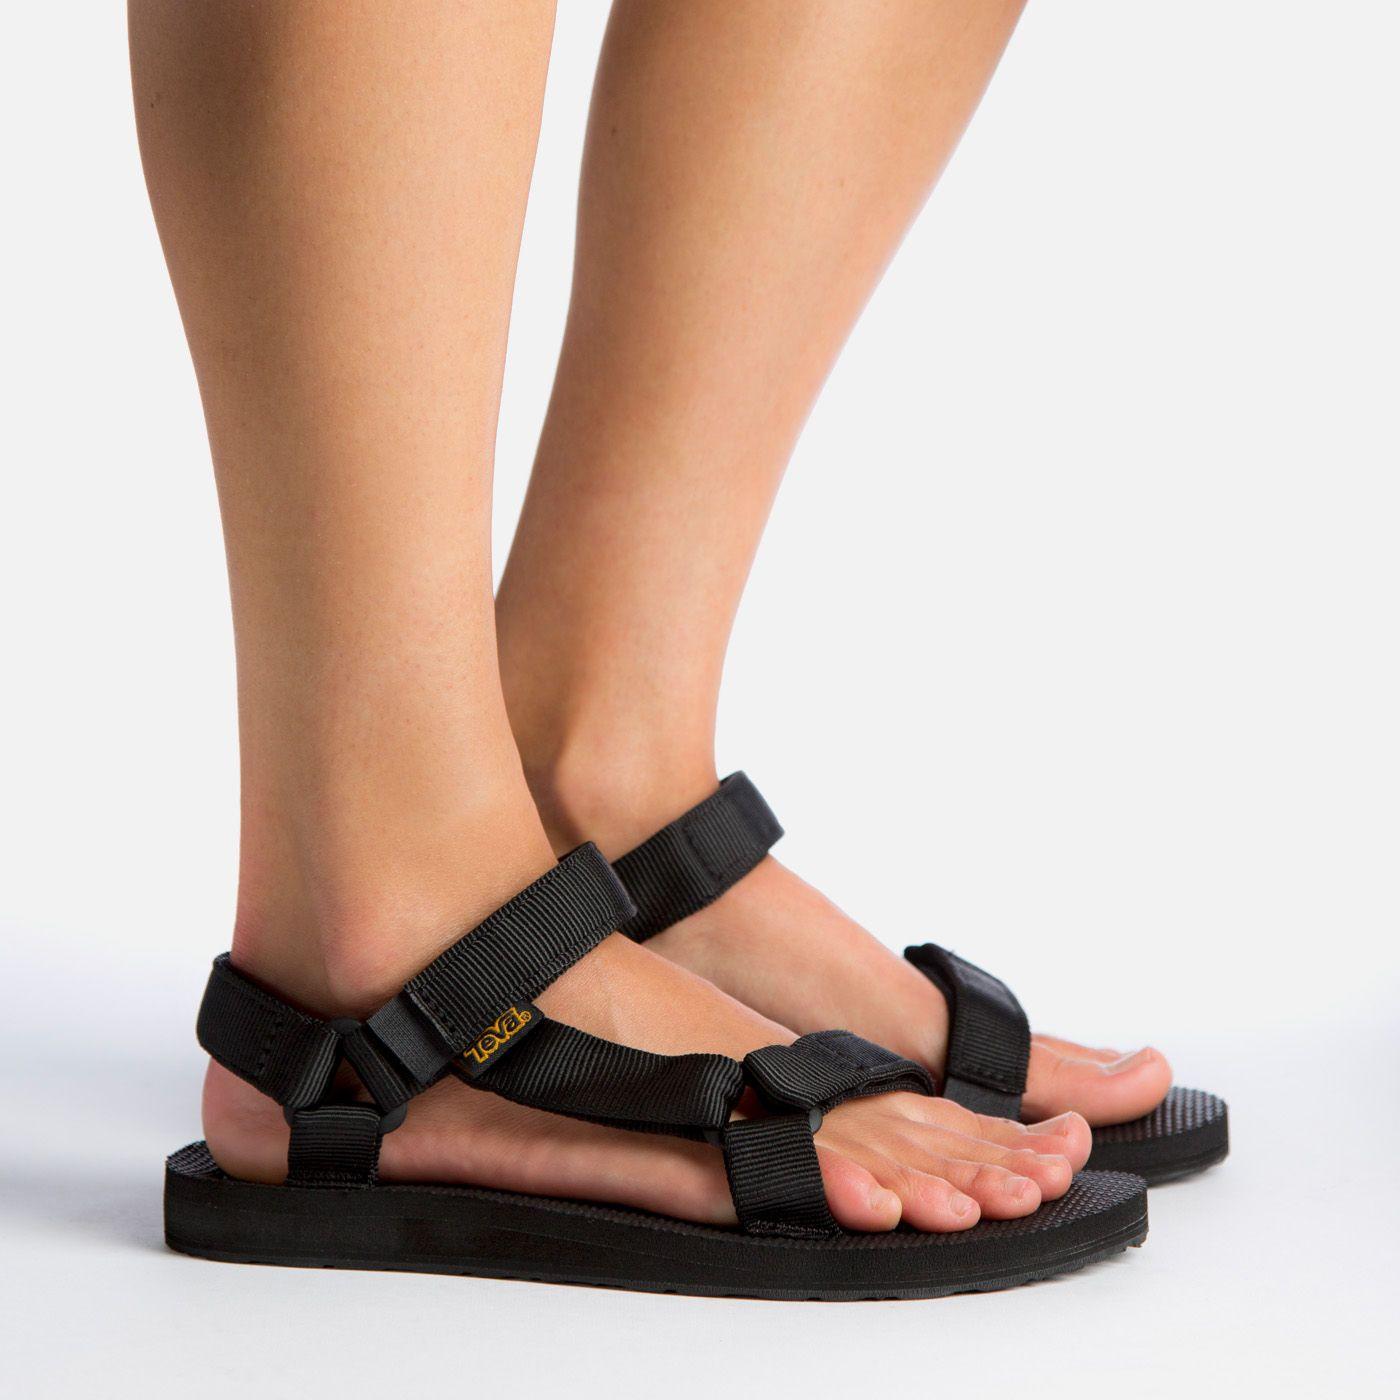 Womens sandals, Teva sandals, Sport sandals